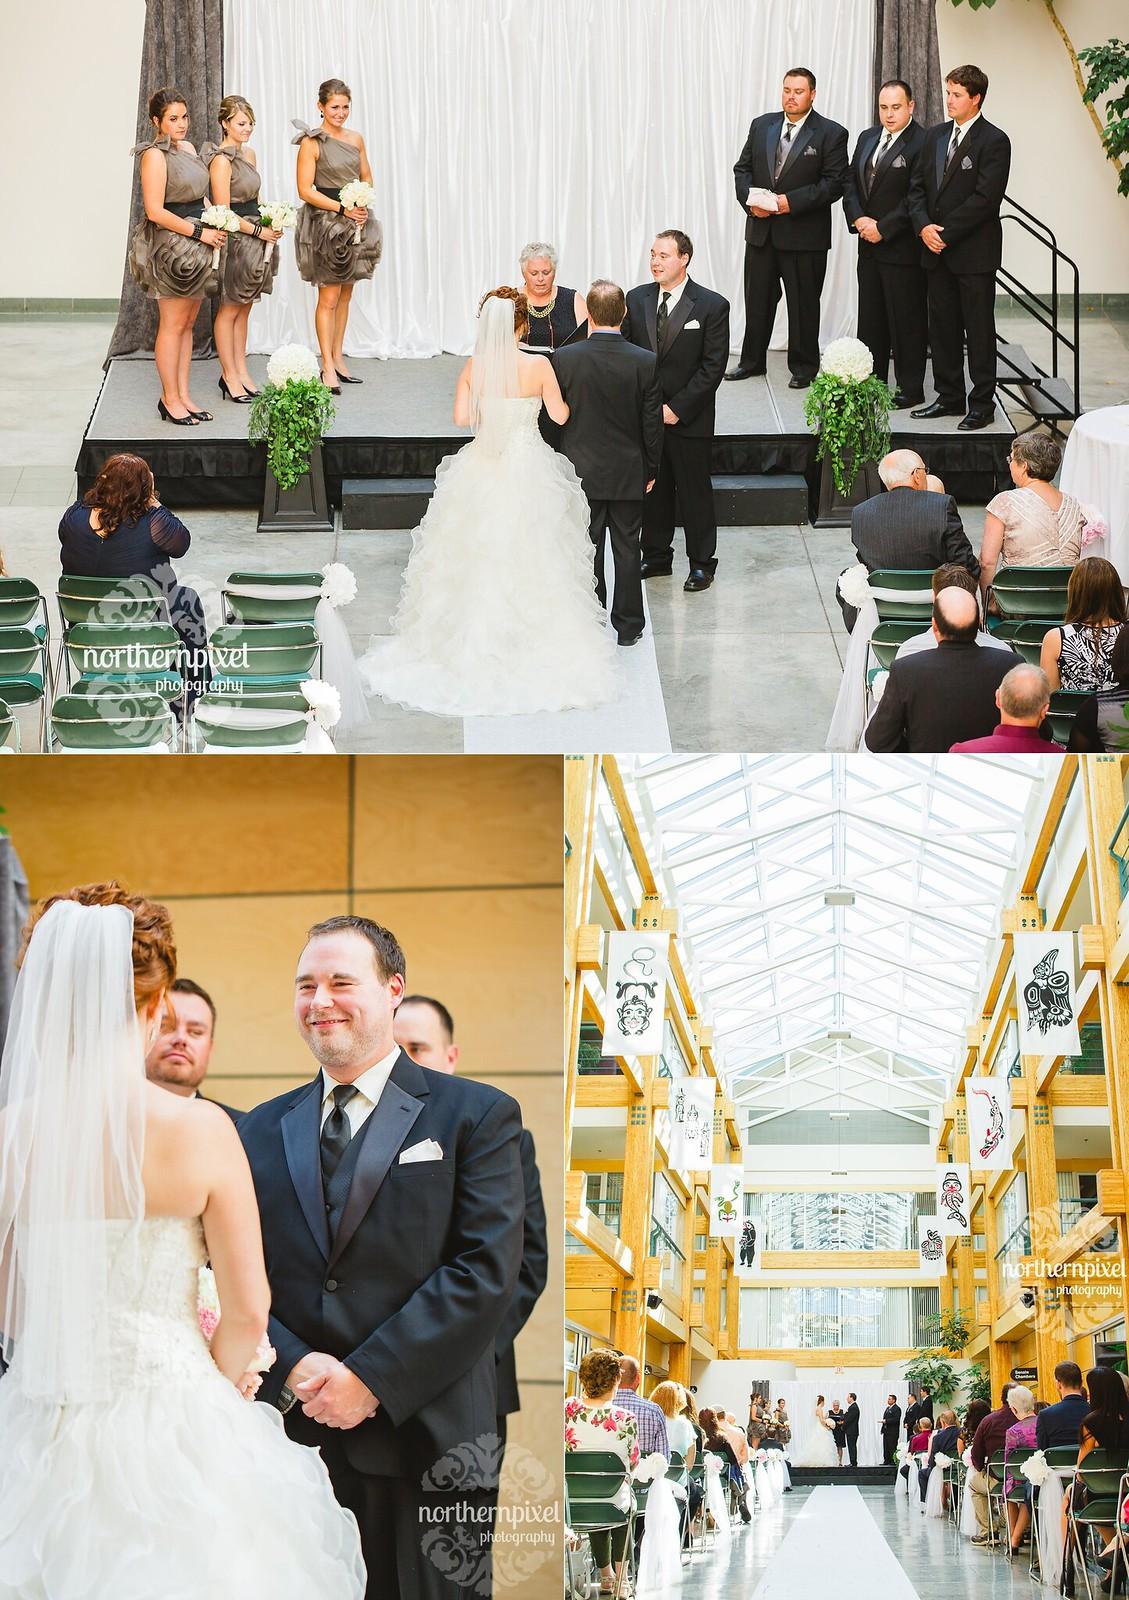 Kendra & Jarrett's Wedding - Prince George BC